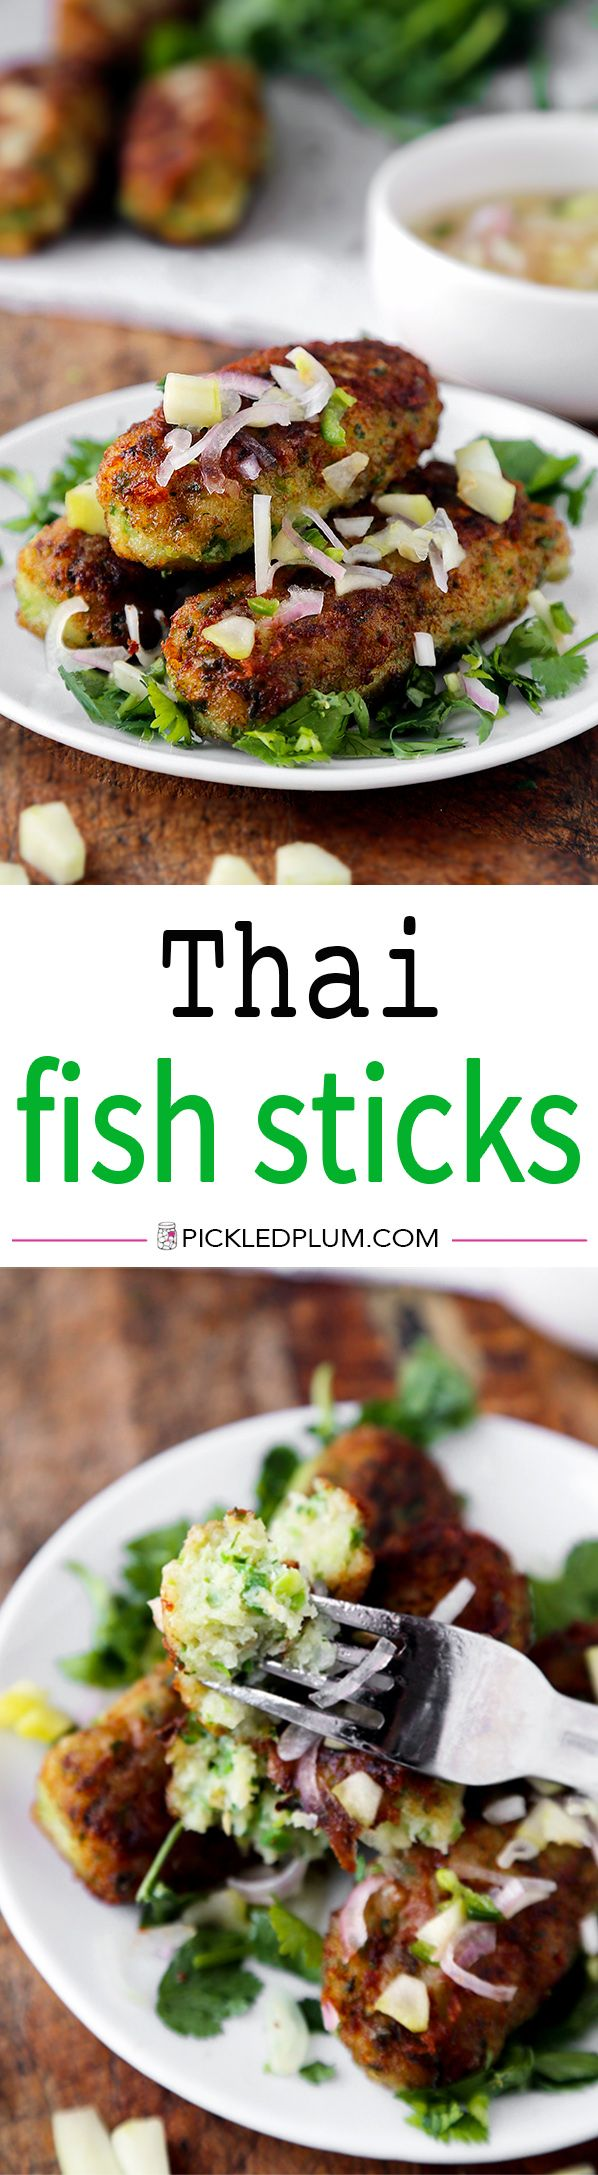 150 best thai food and thai recipes images on pinterest thai fish sticks thai sushi recipesthai food recipeshealthy dinner forumfinder Images